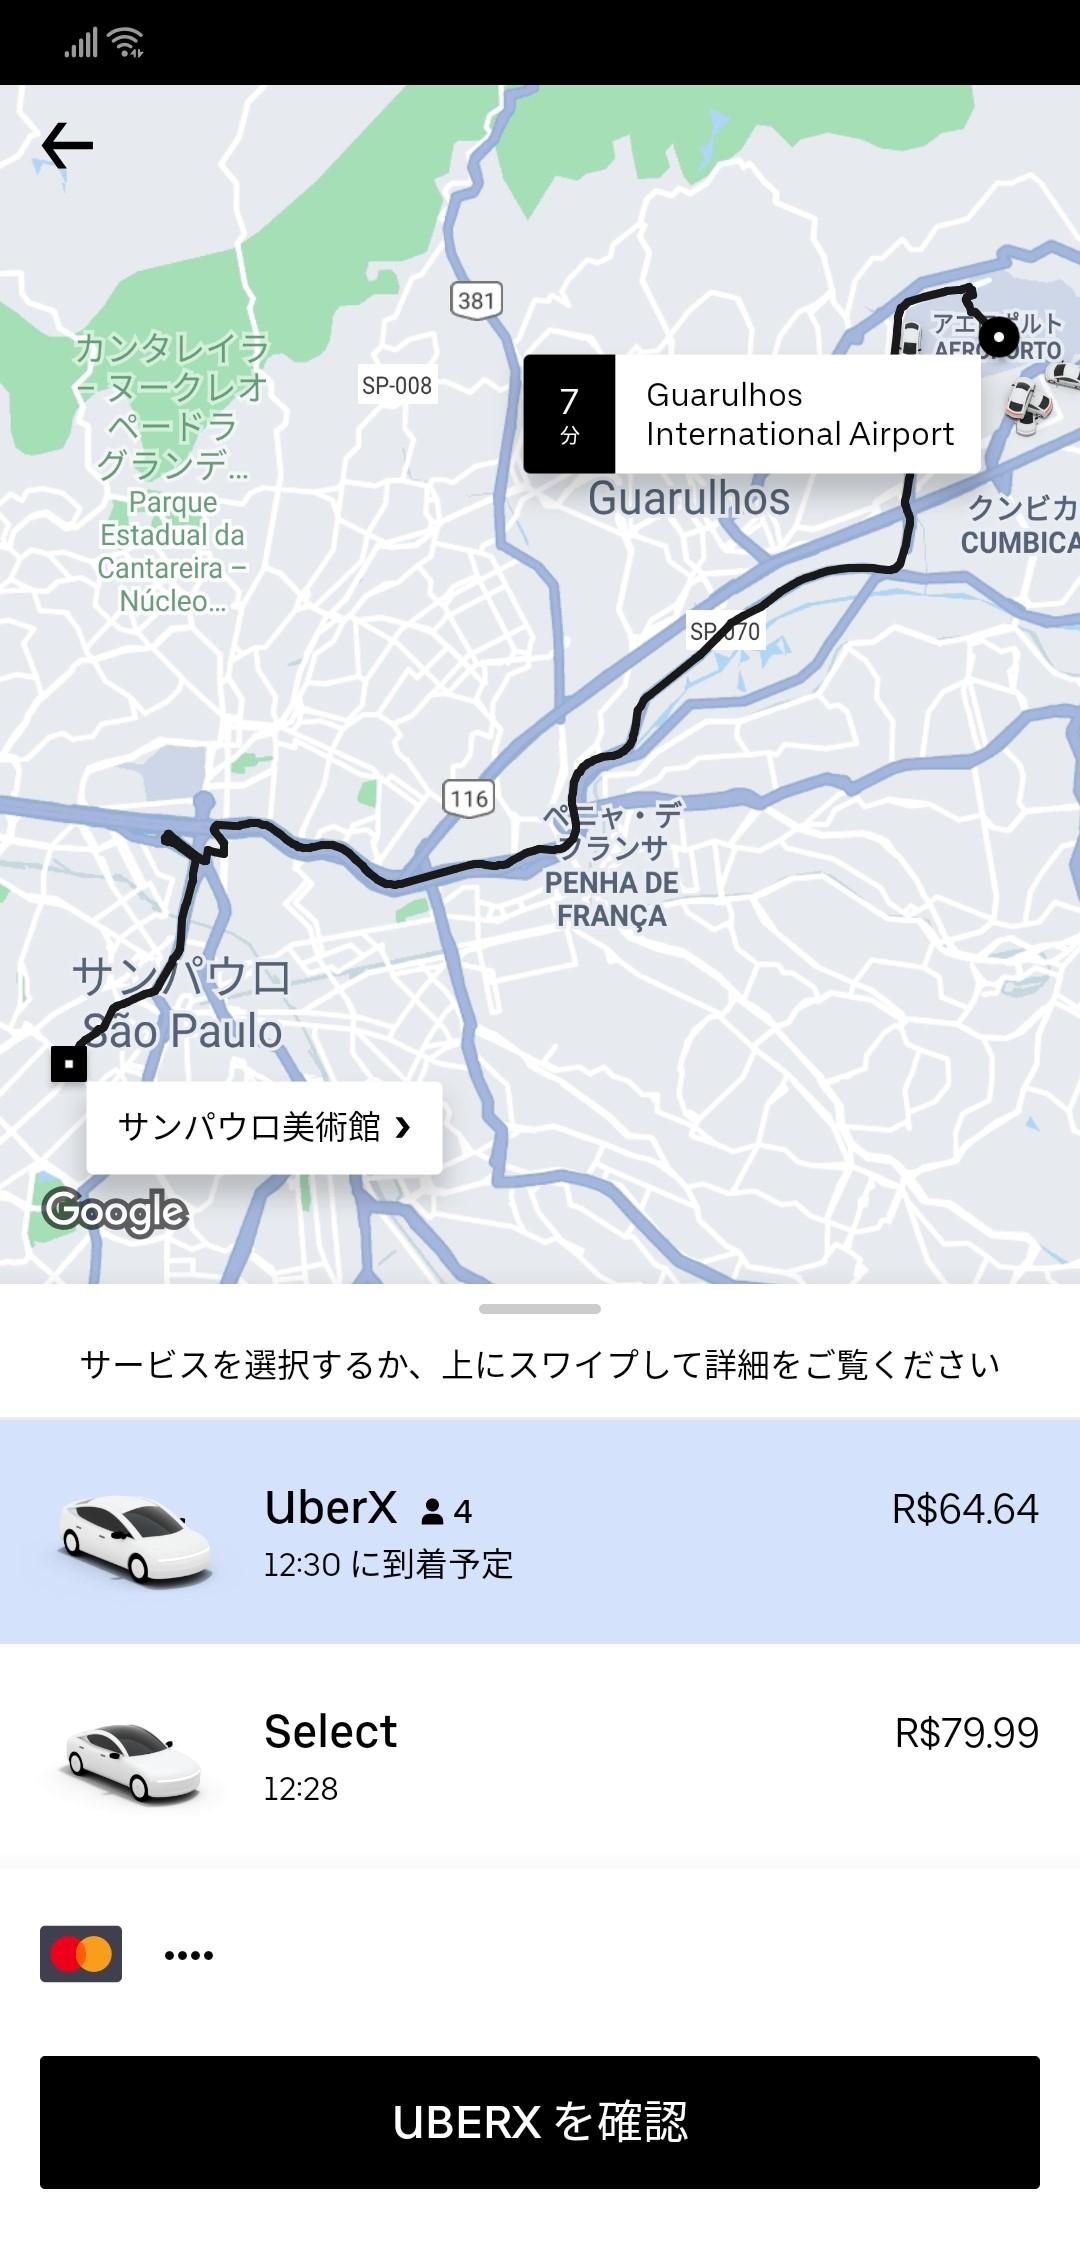 Uber車タイプと料金確認画面